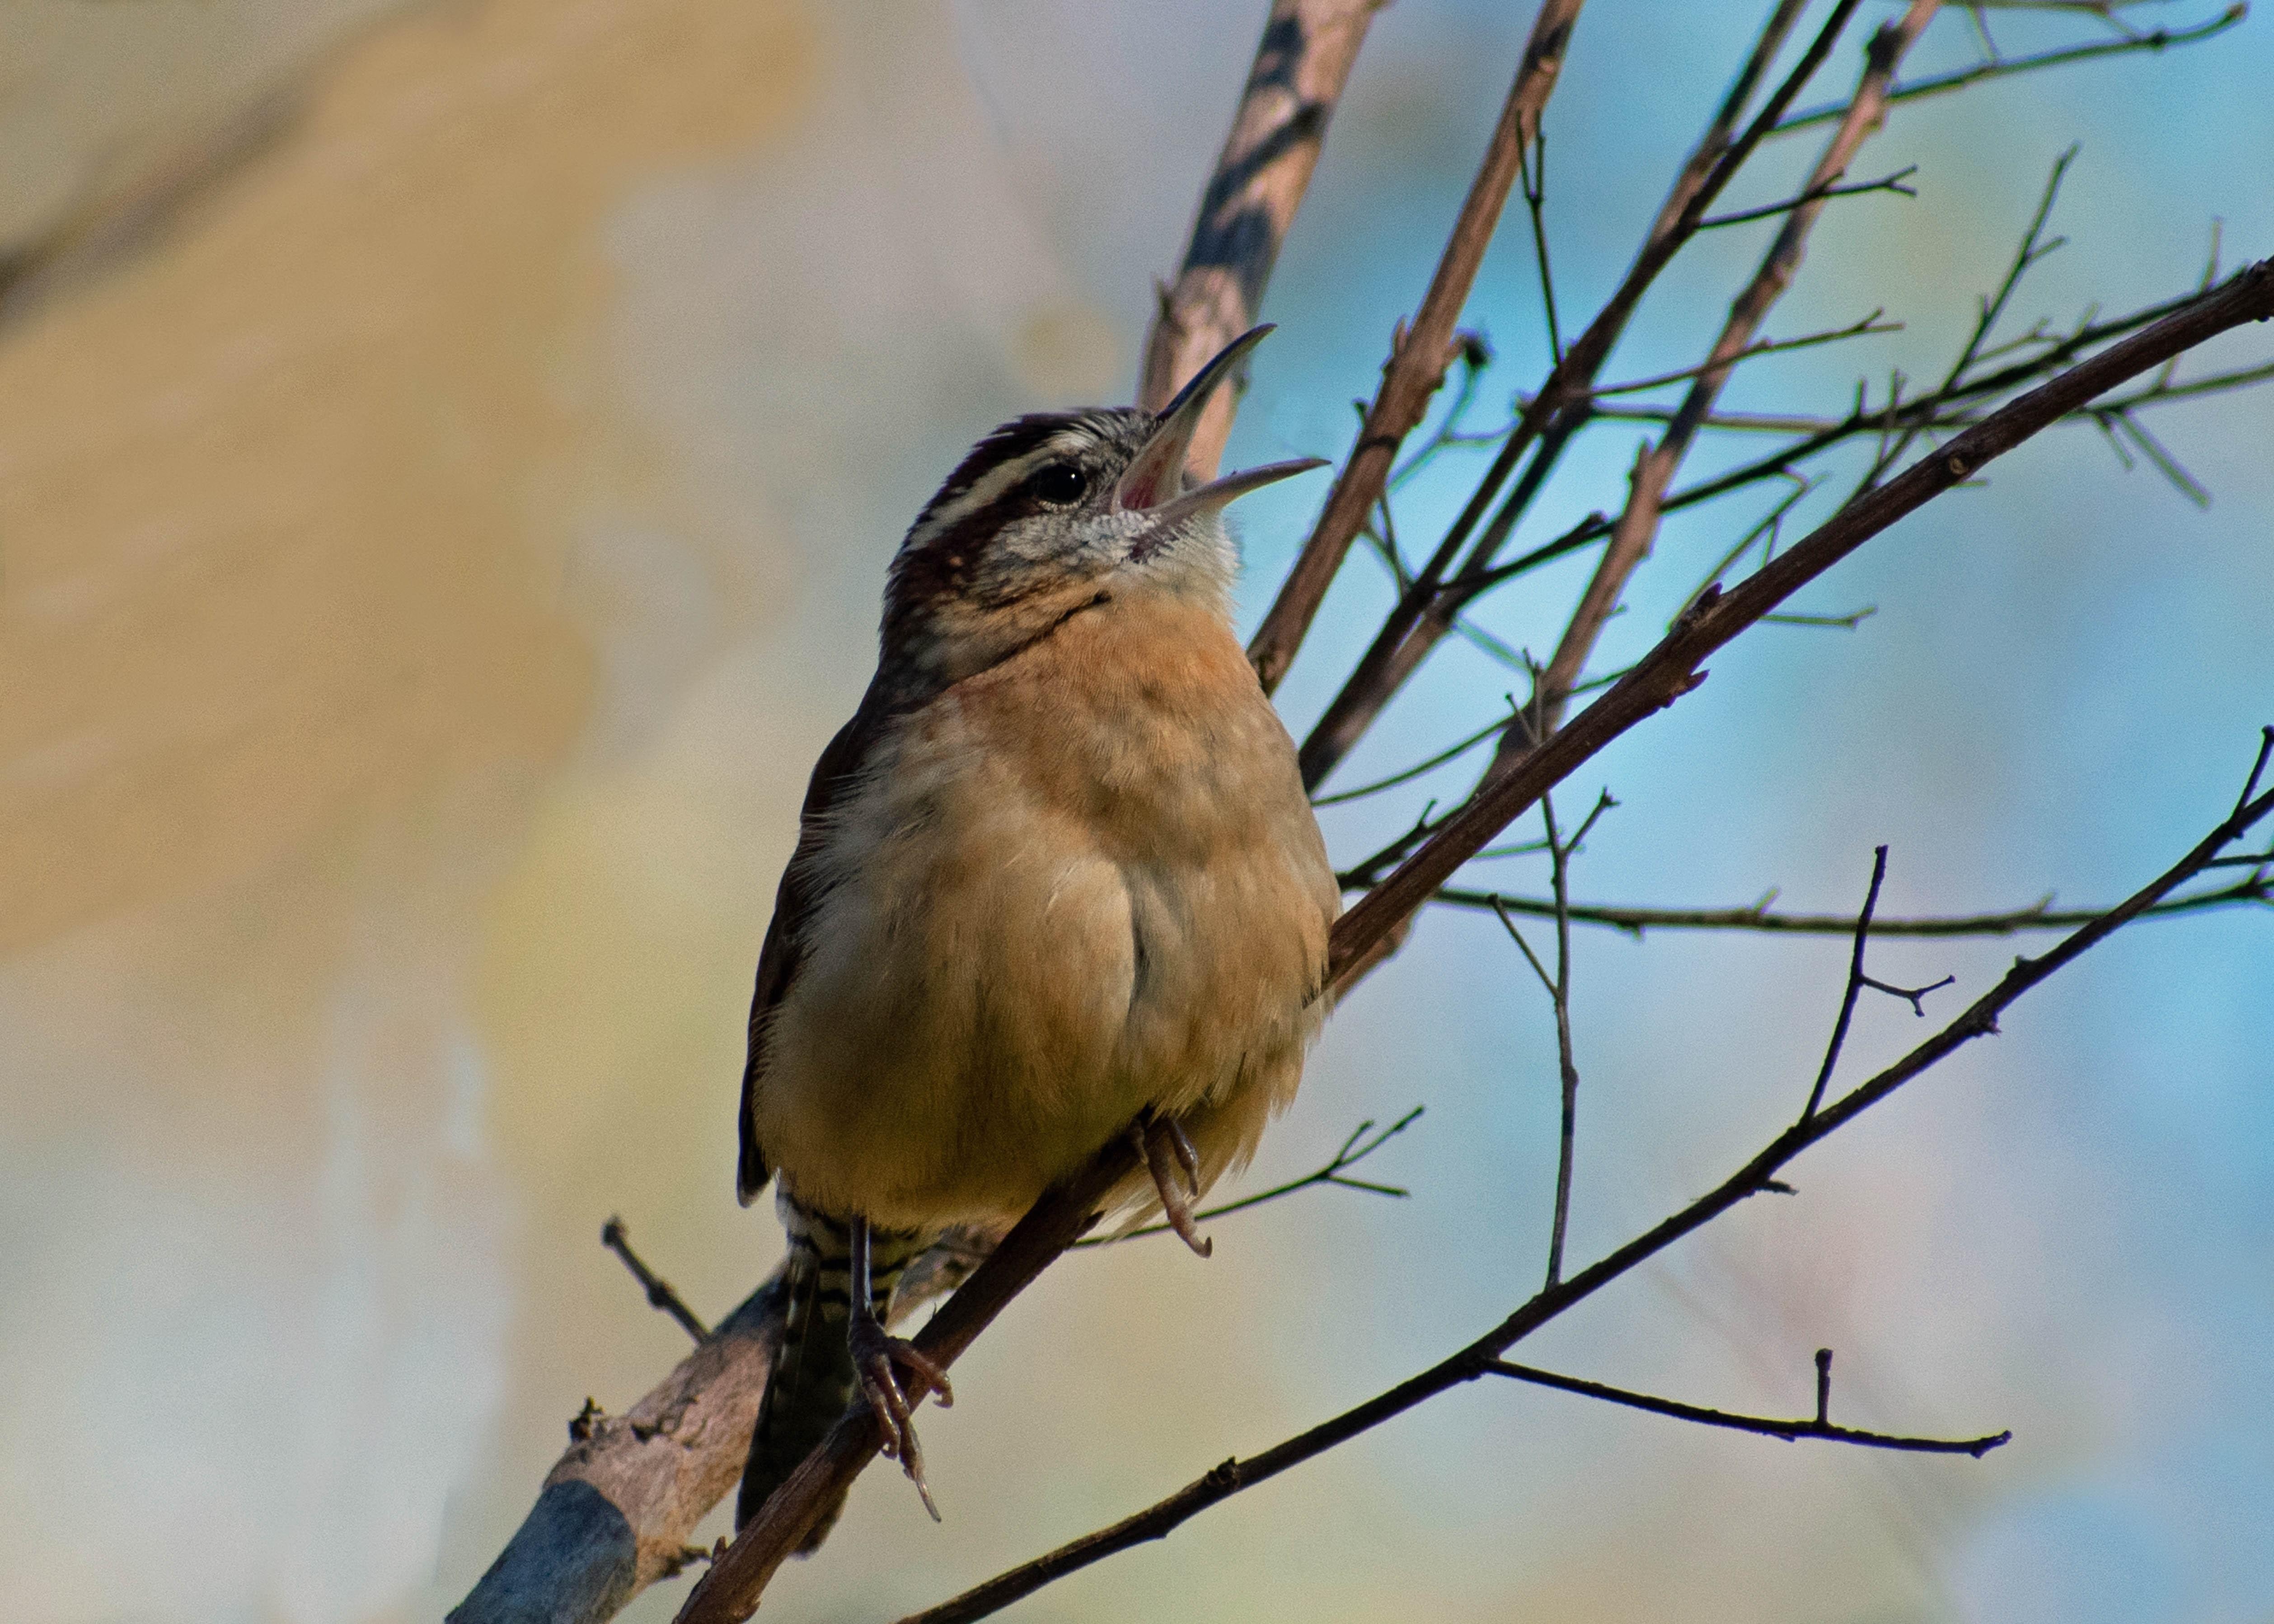 by Phylis Castelli, Singing wren